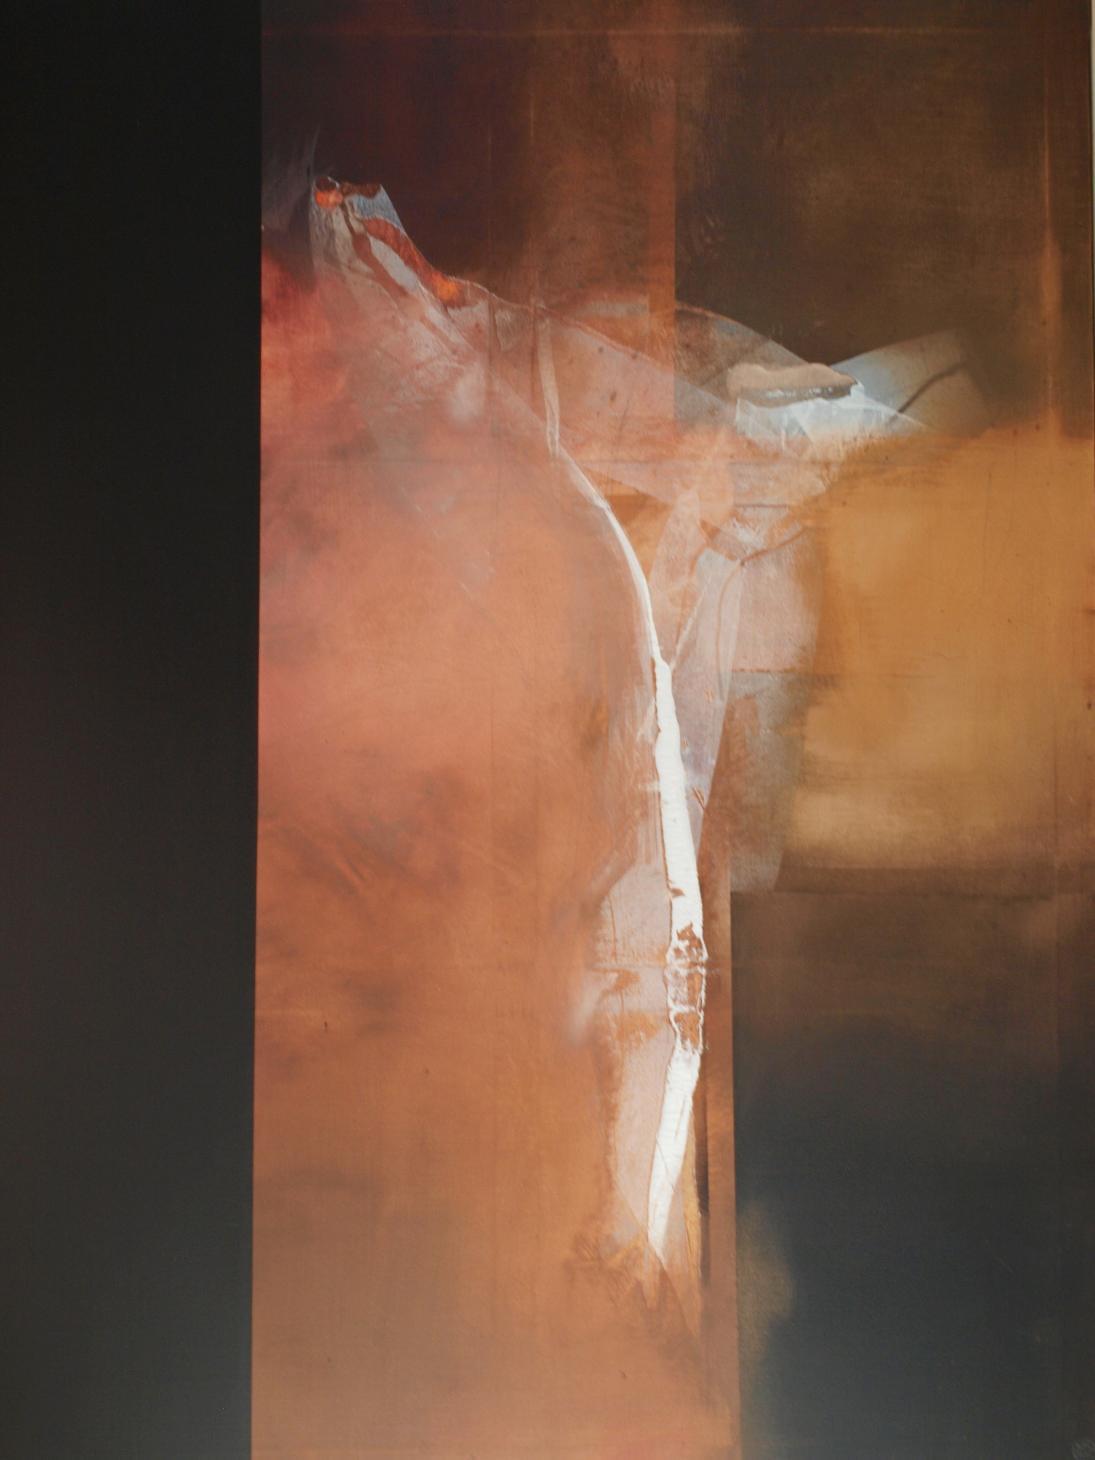 GENESIS Nº 3 (2012) - Nacho Mur Zubillaga